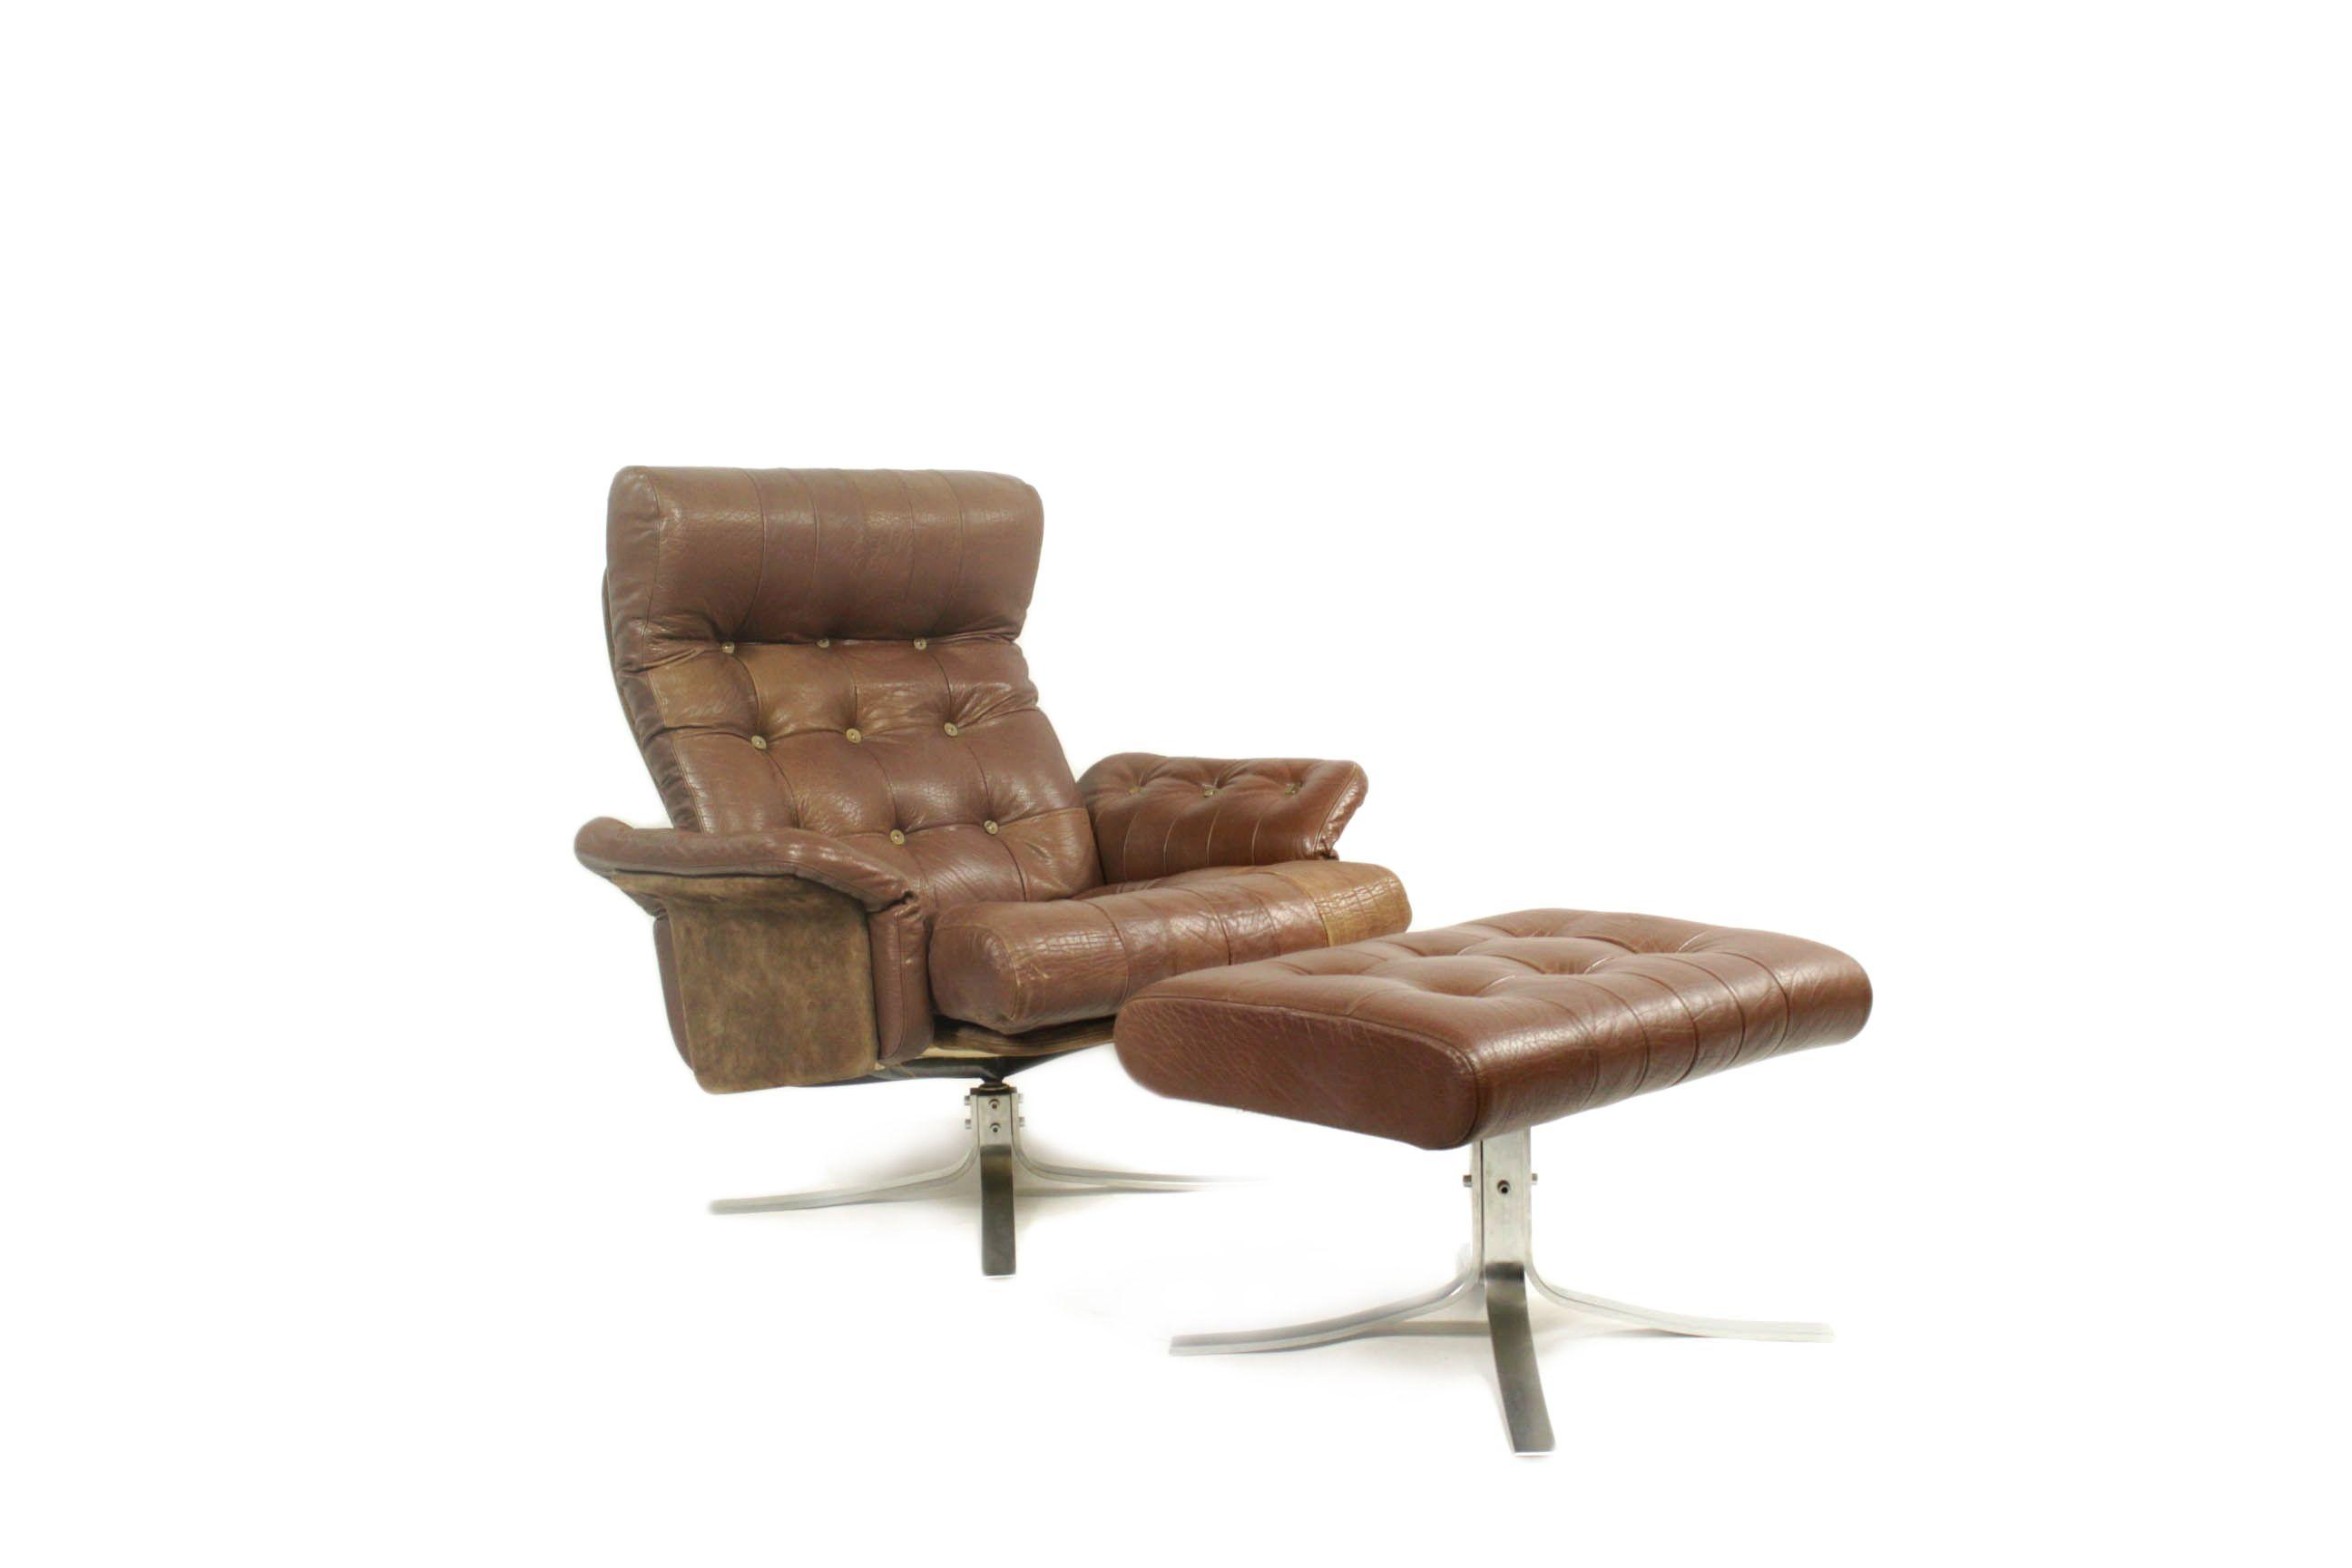 Vintage Danish Leather Swivel Lounge Chair With Ottoman By Ebbe Gehl Soren Nissen For Jeki Mobler